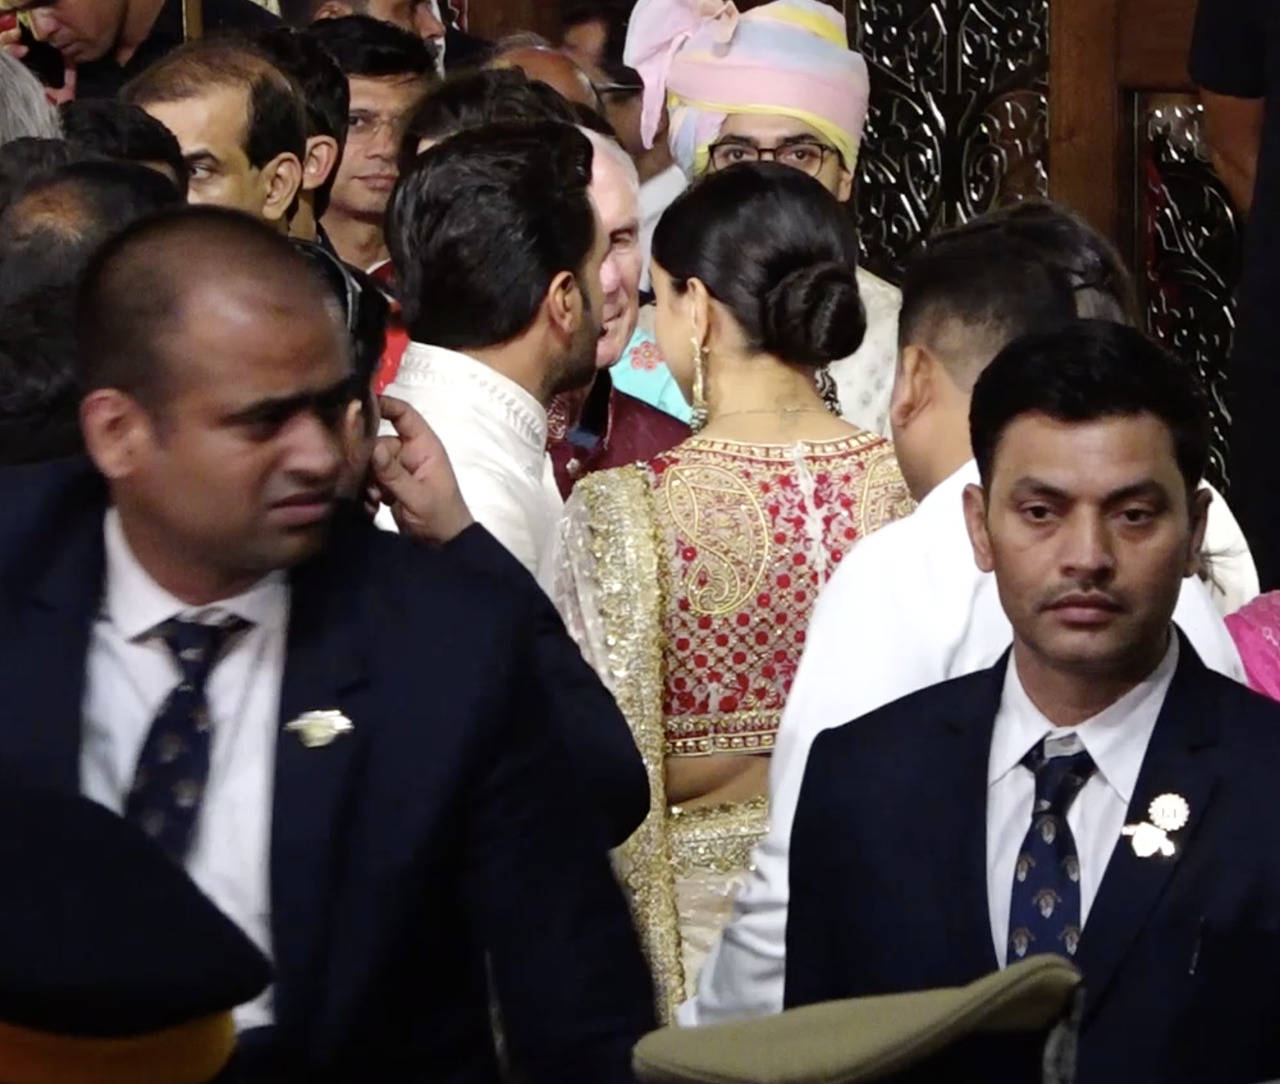 Deepika Padukone RK tattoo photos pictures images pics video at Isha Ambani and Anand Piramal wedding marriage